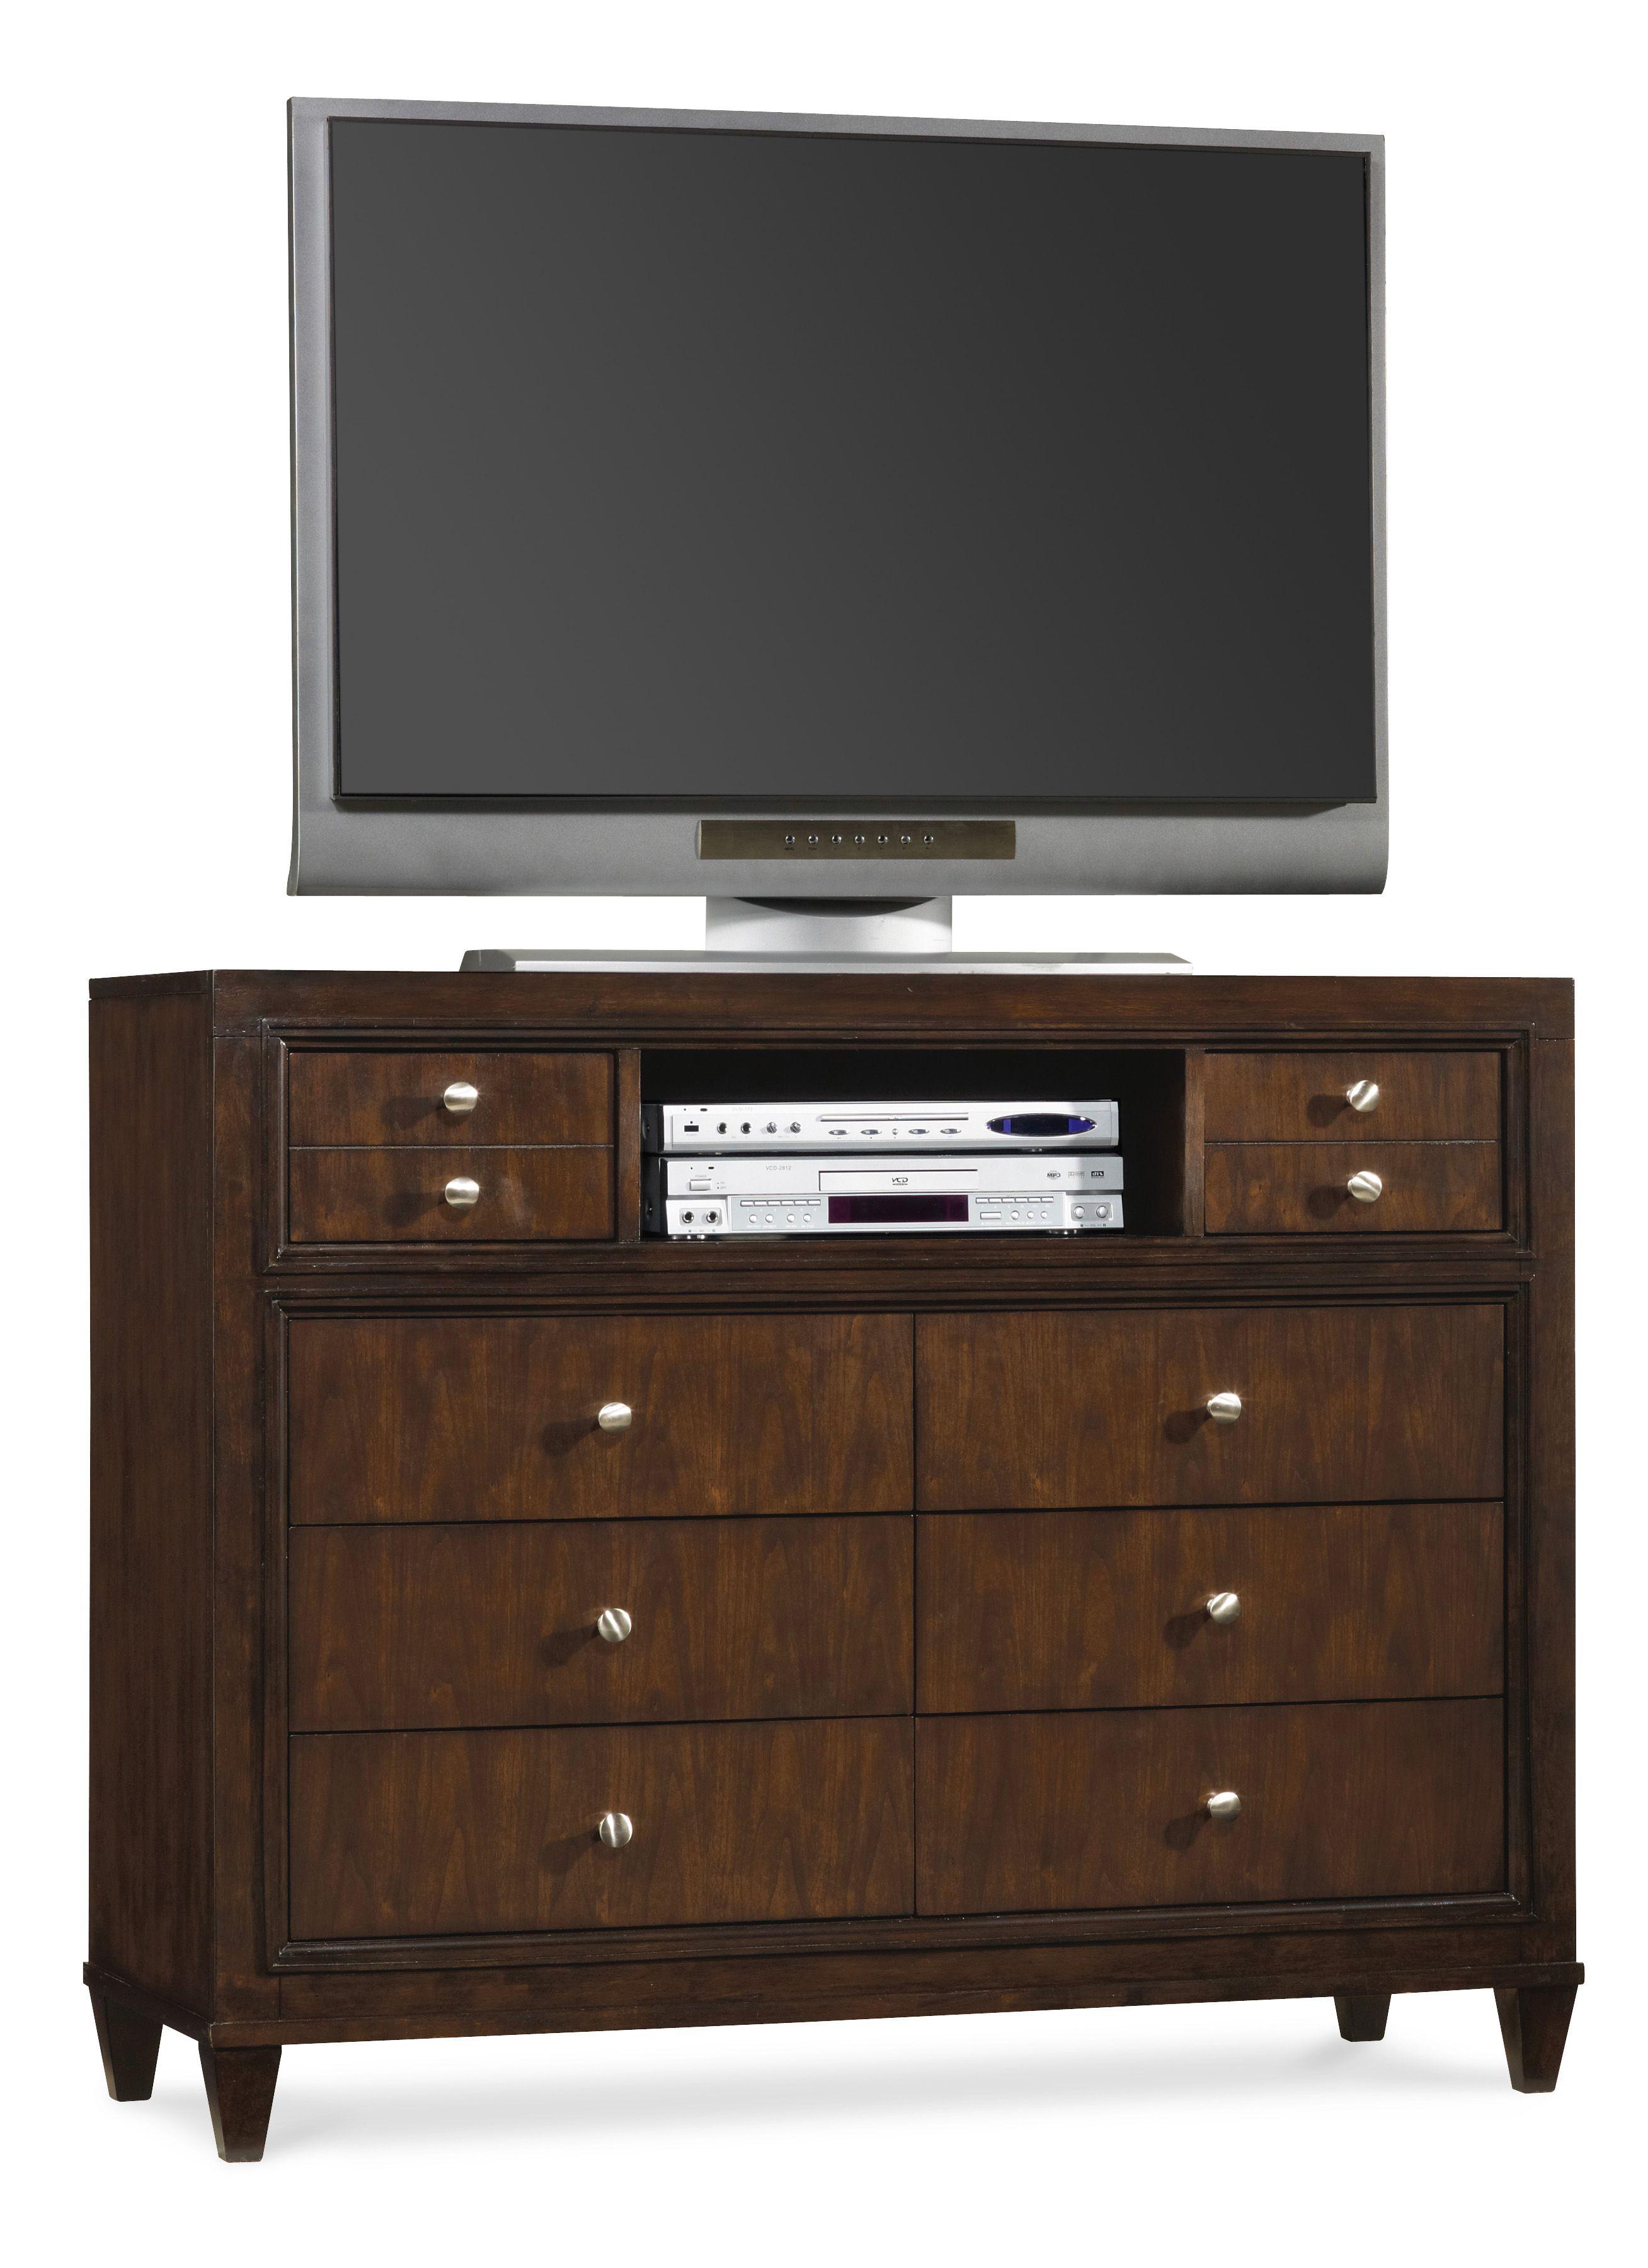 Hooker Furniture Ludlow Media Chest 1030 91117